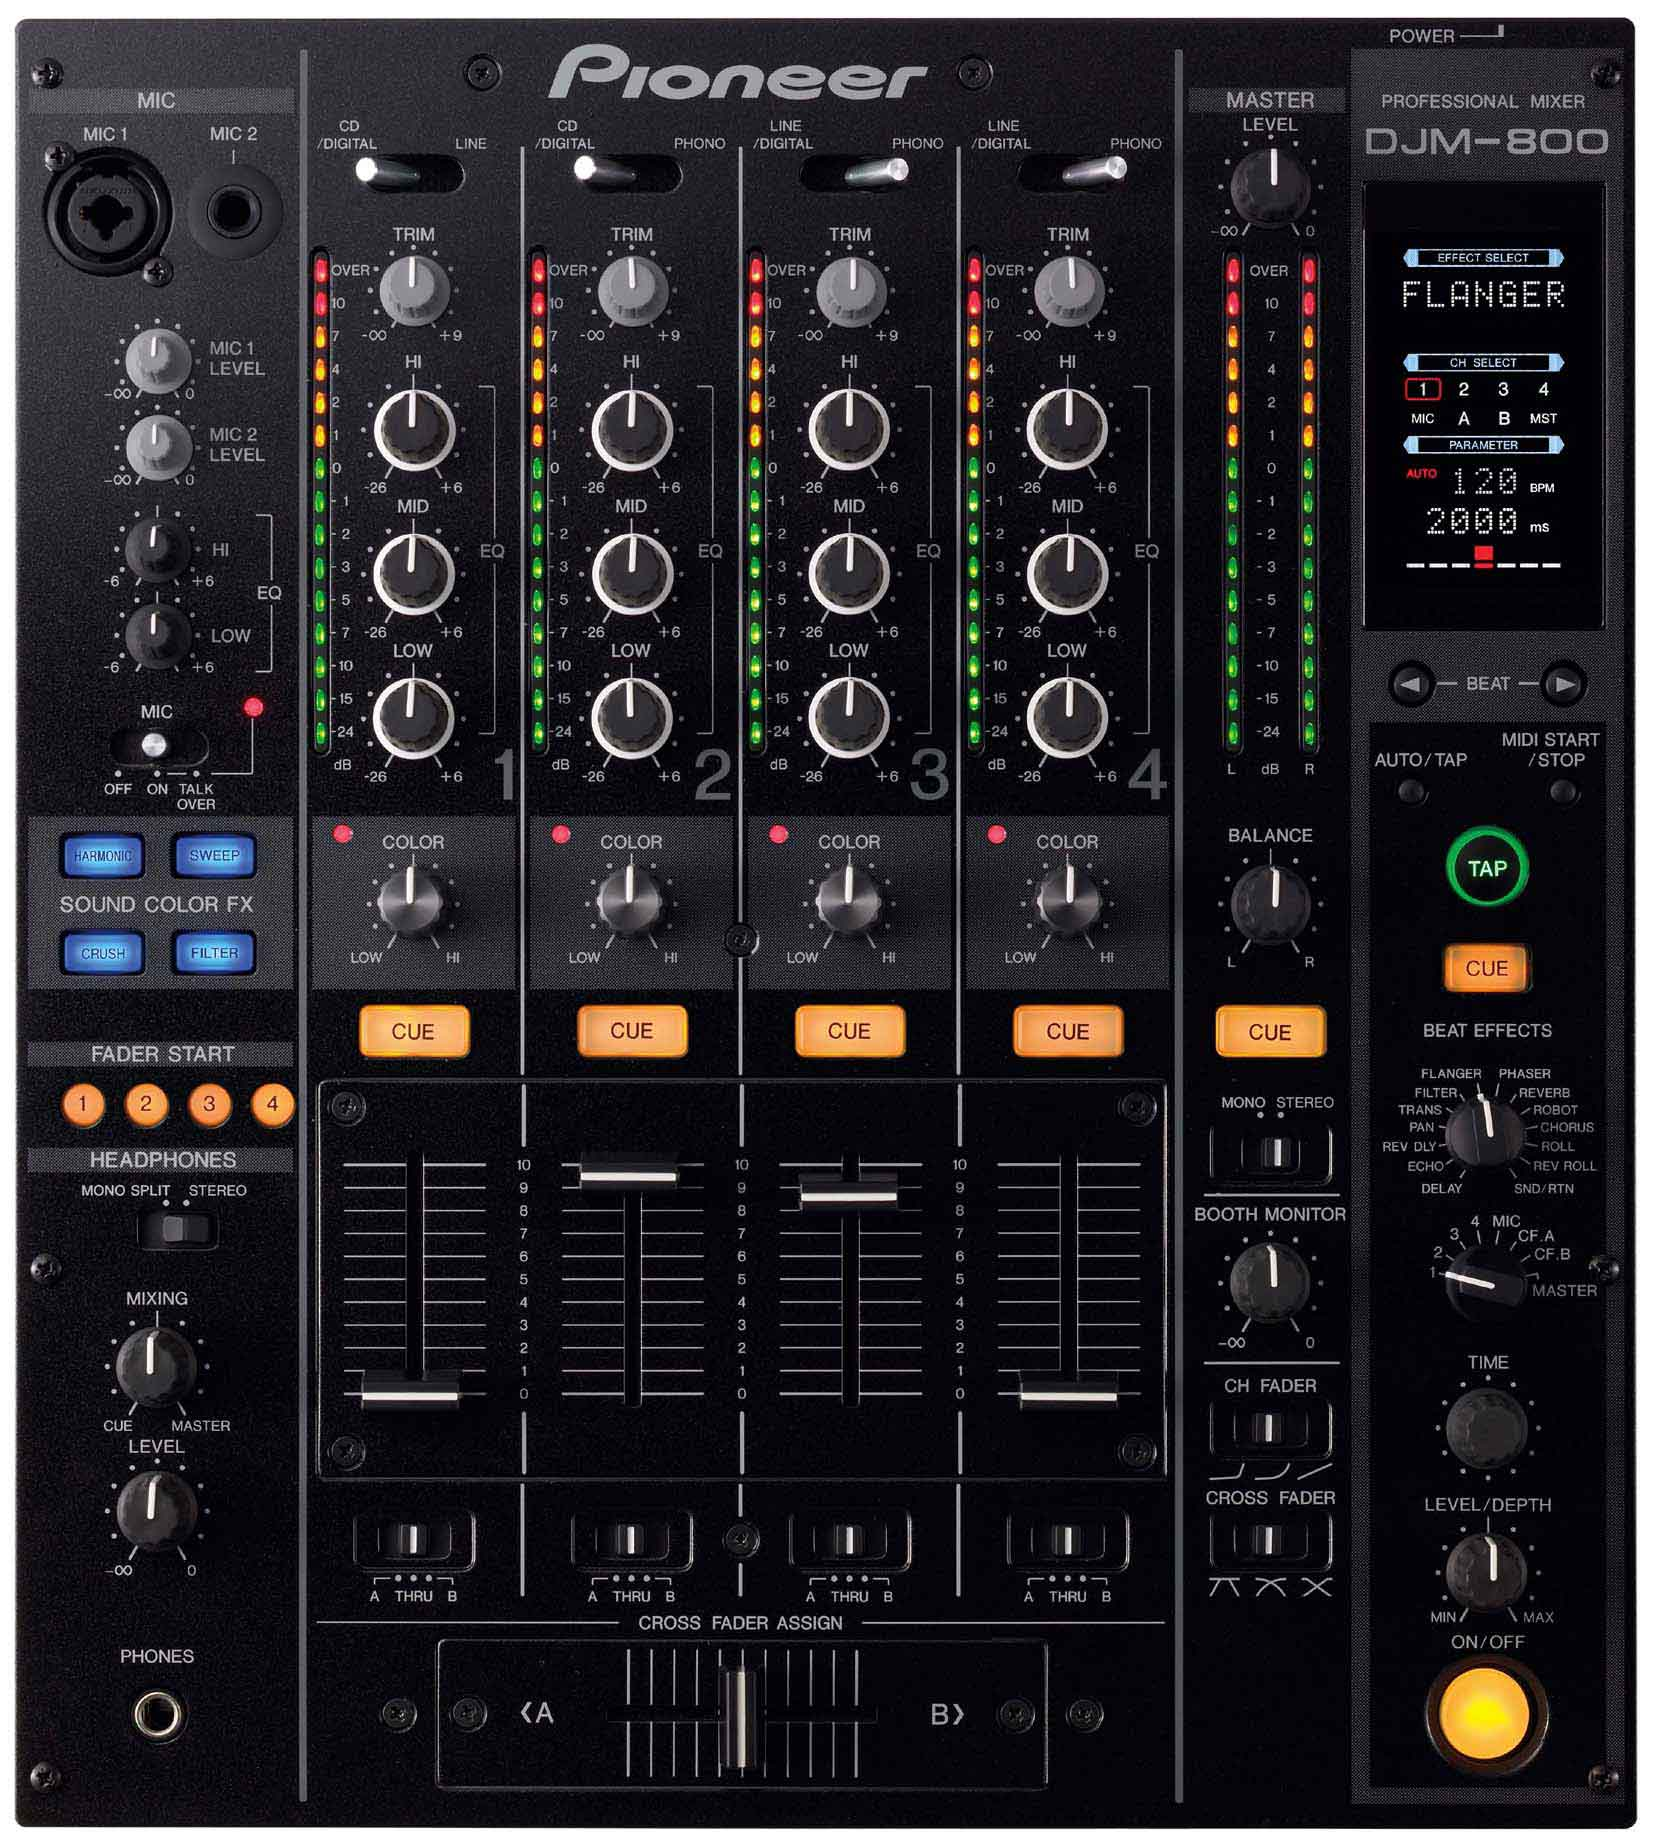 DJM 800 Image